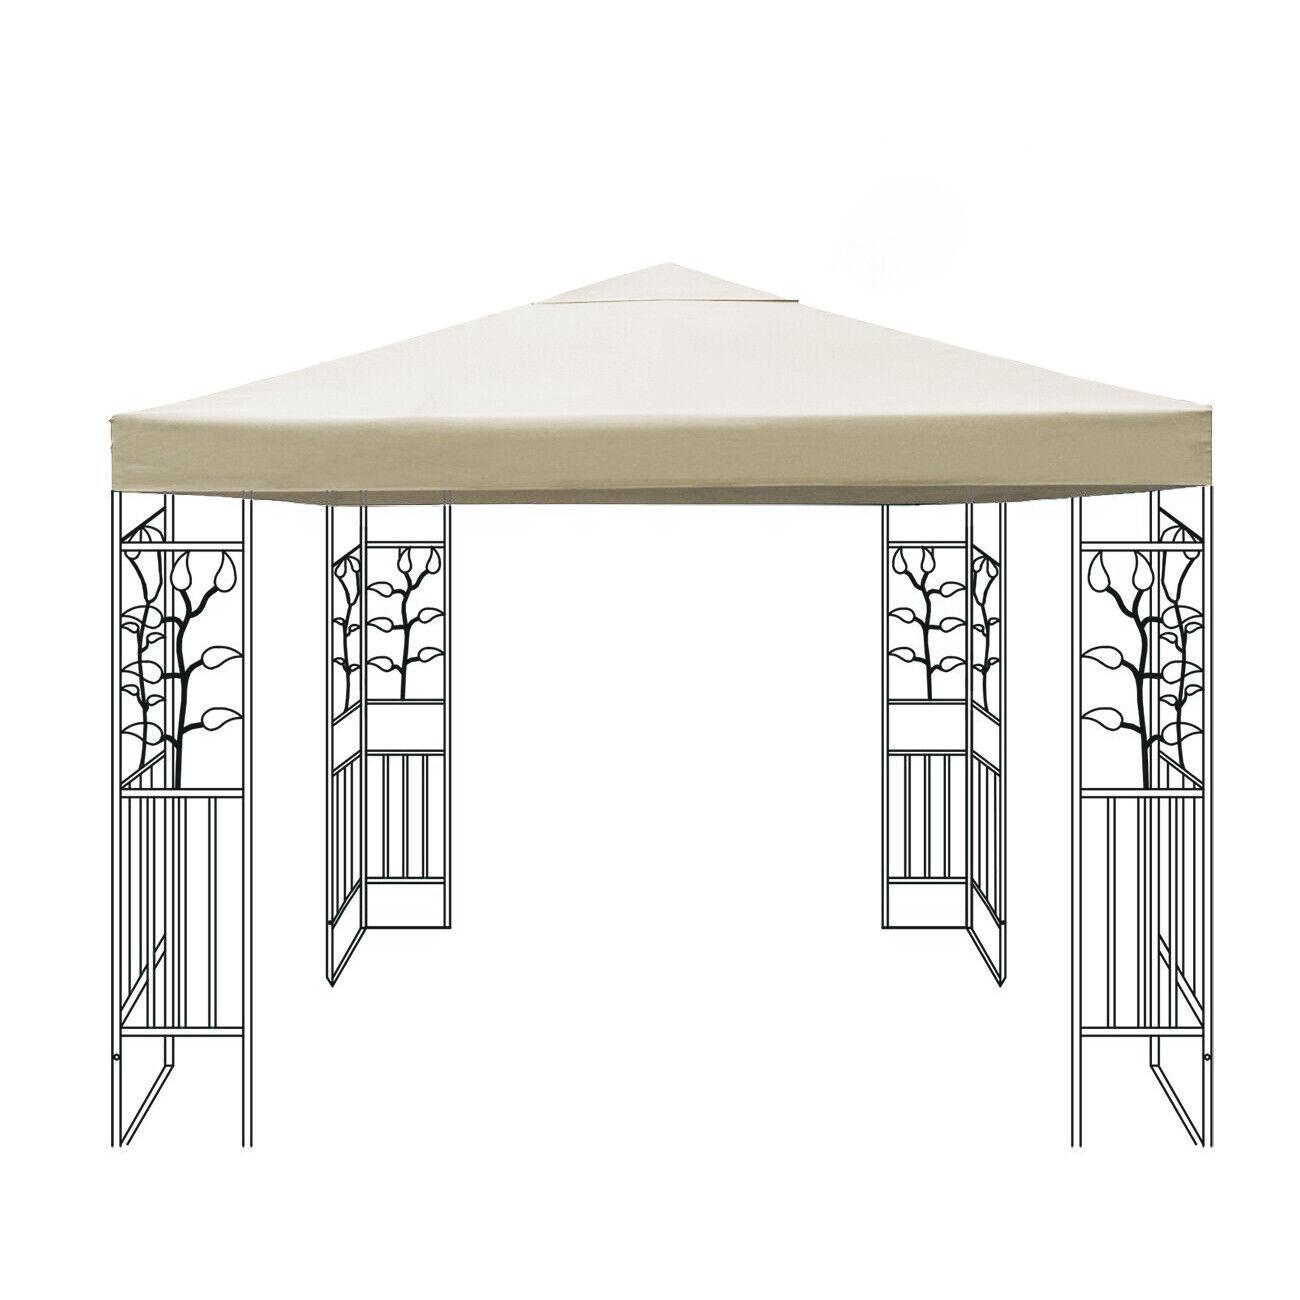 Cenador techo lona cubierta de repuesto sustituto plane Cochepa lona 3x3 beige impermeable